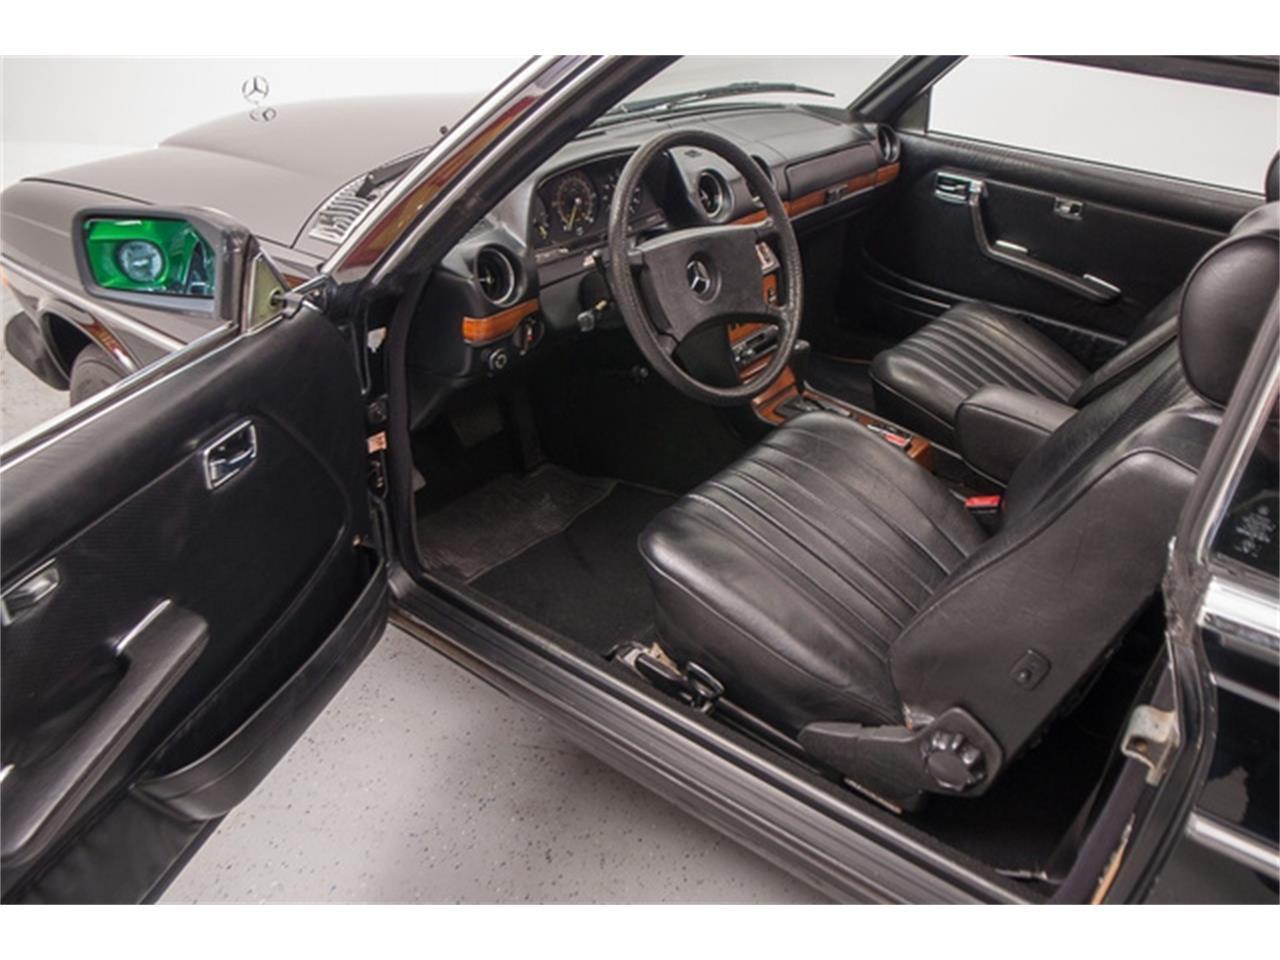 1981 Mercedes-Benz 280 (CC-1299939) for sale in St. Louis, Missouri